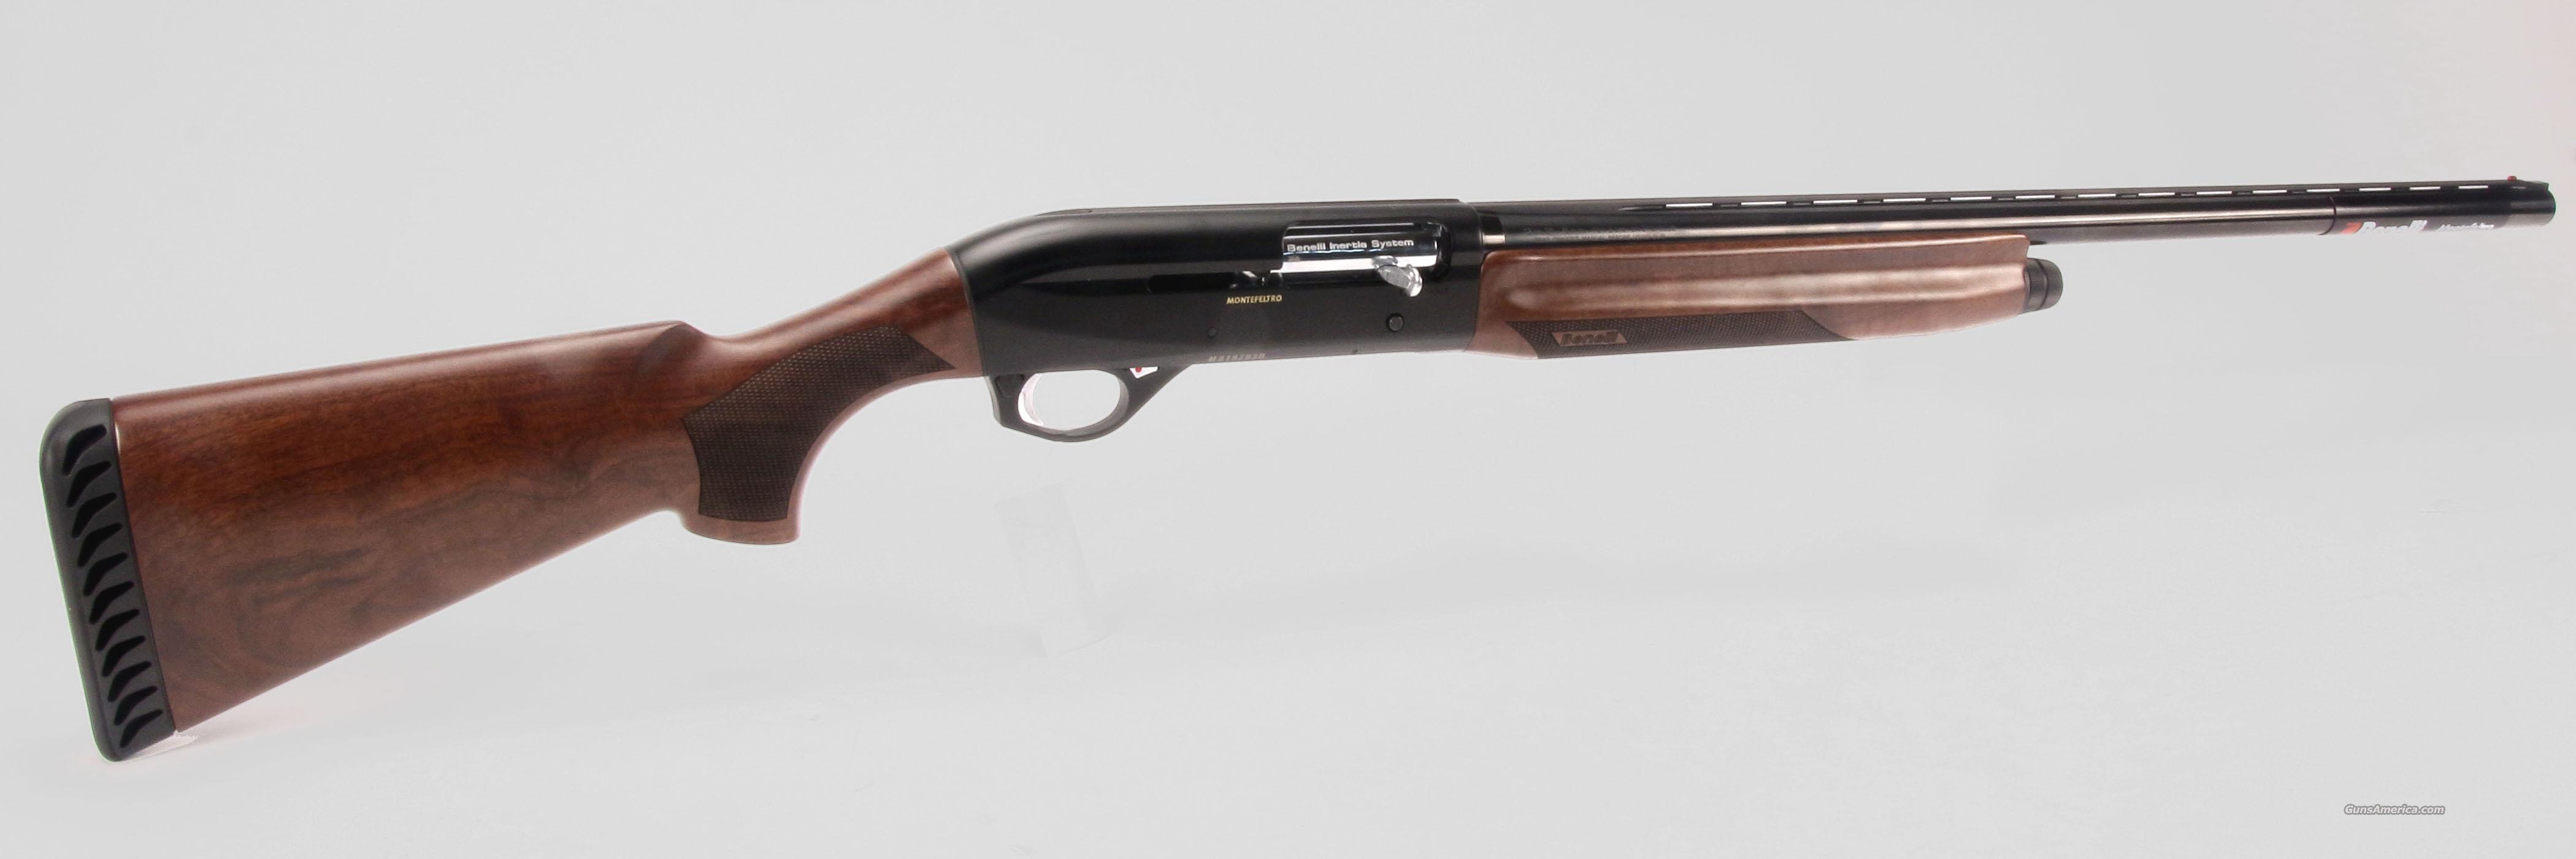 Benelli Montefeltro Shotgun For Sale